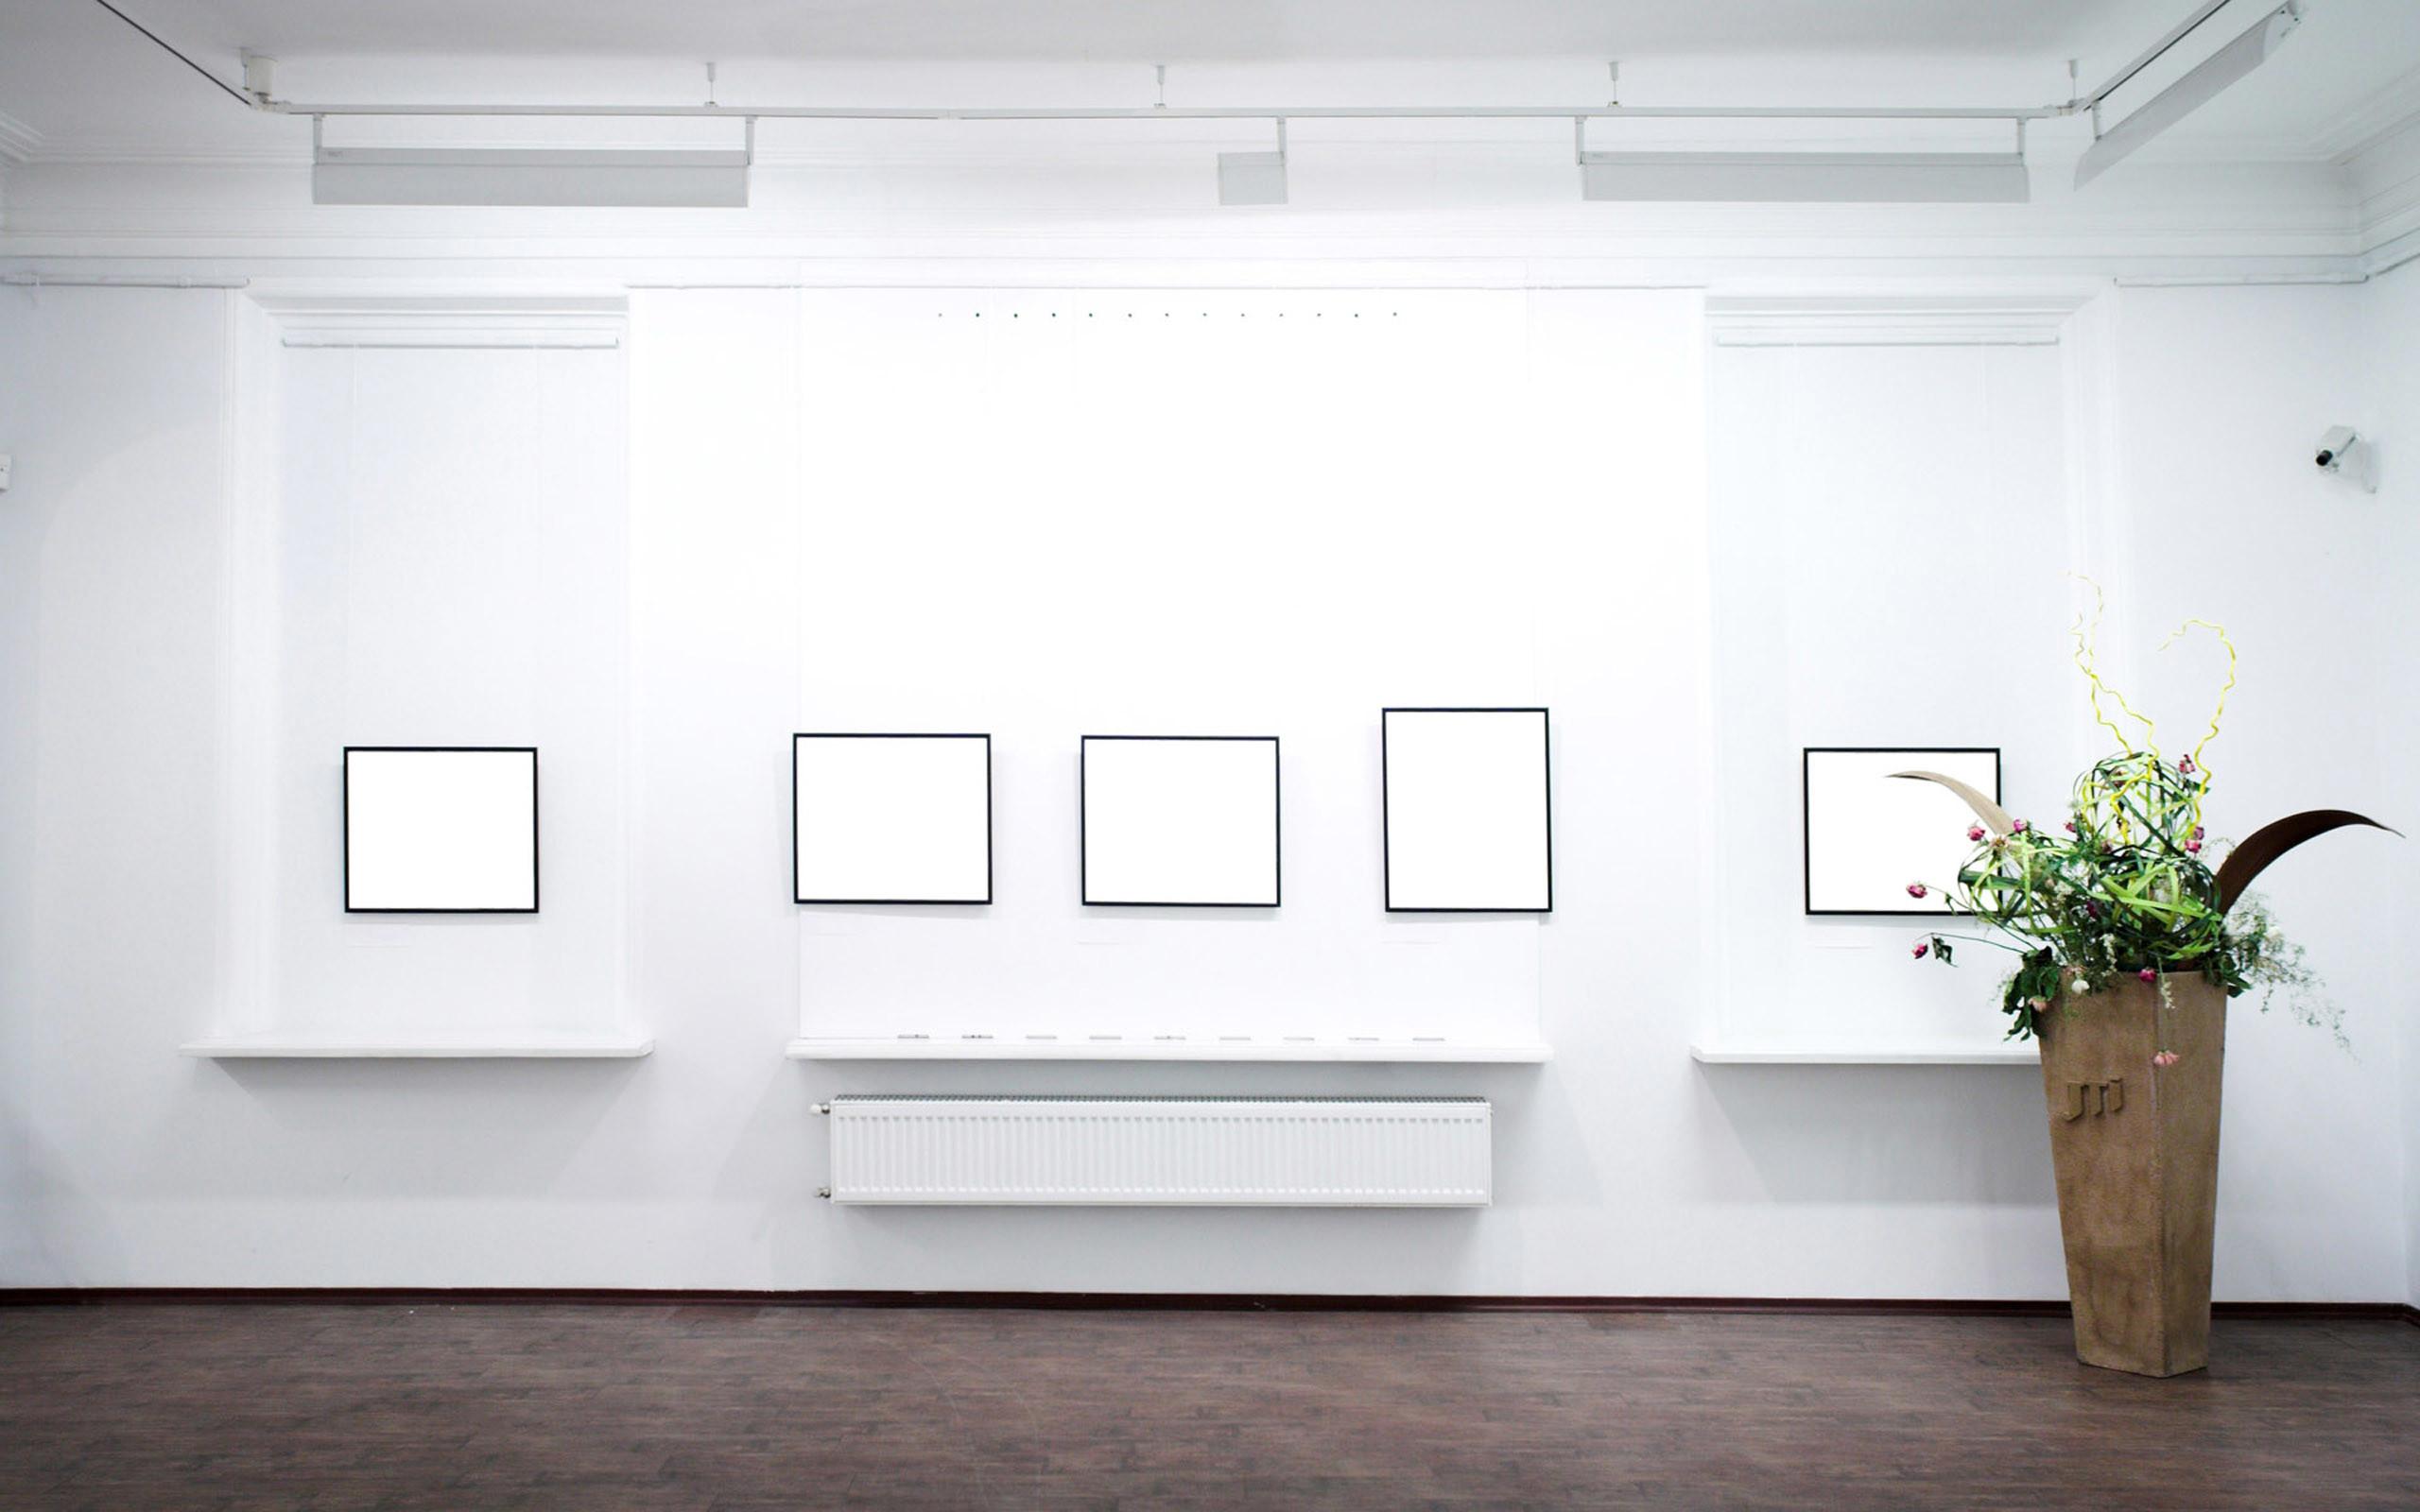 office desktop wallpaper,white,wall,line,room,floor